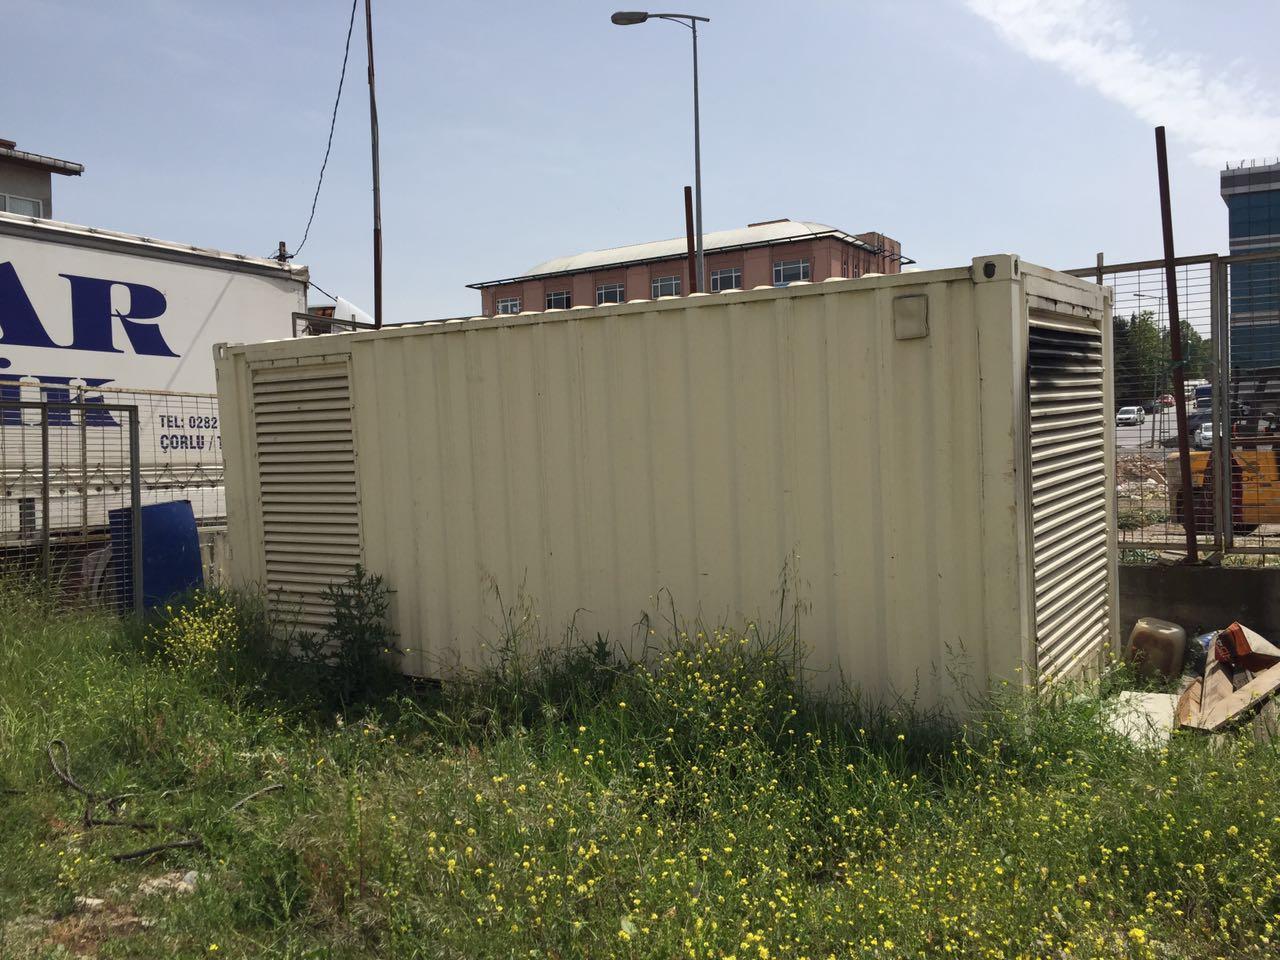 Çukurova - Perkins 550 kVA Dizel Jeneratör